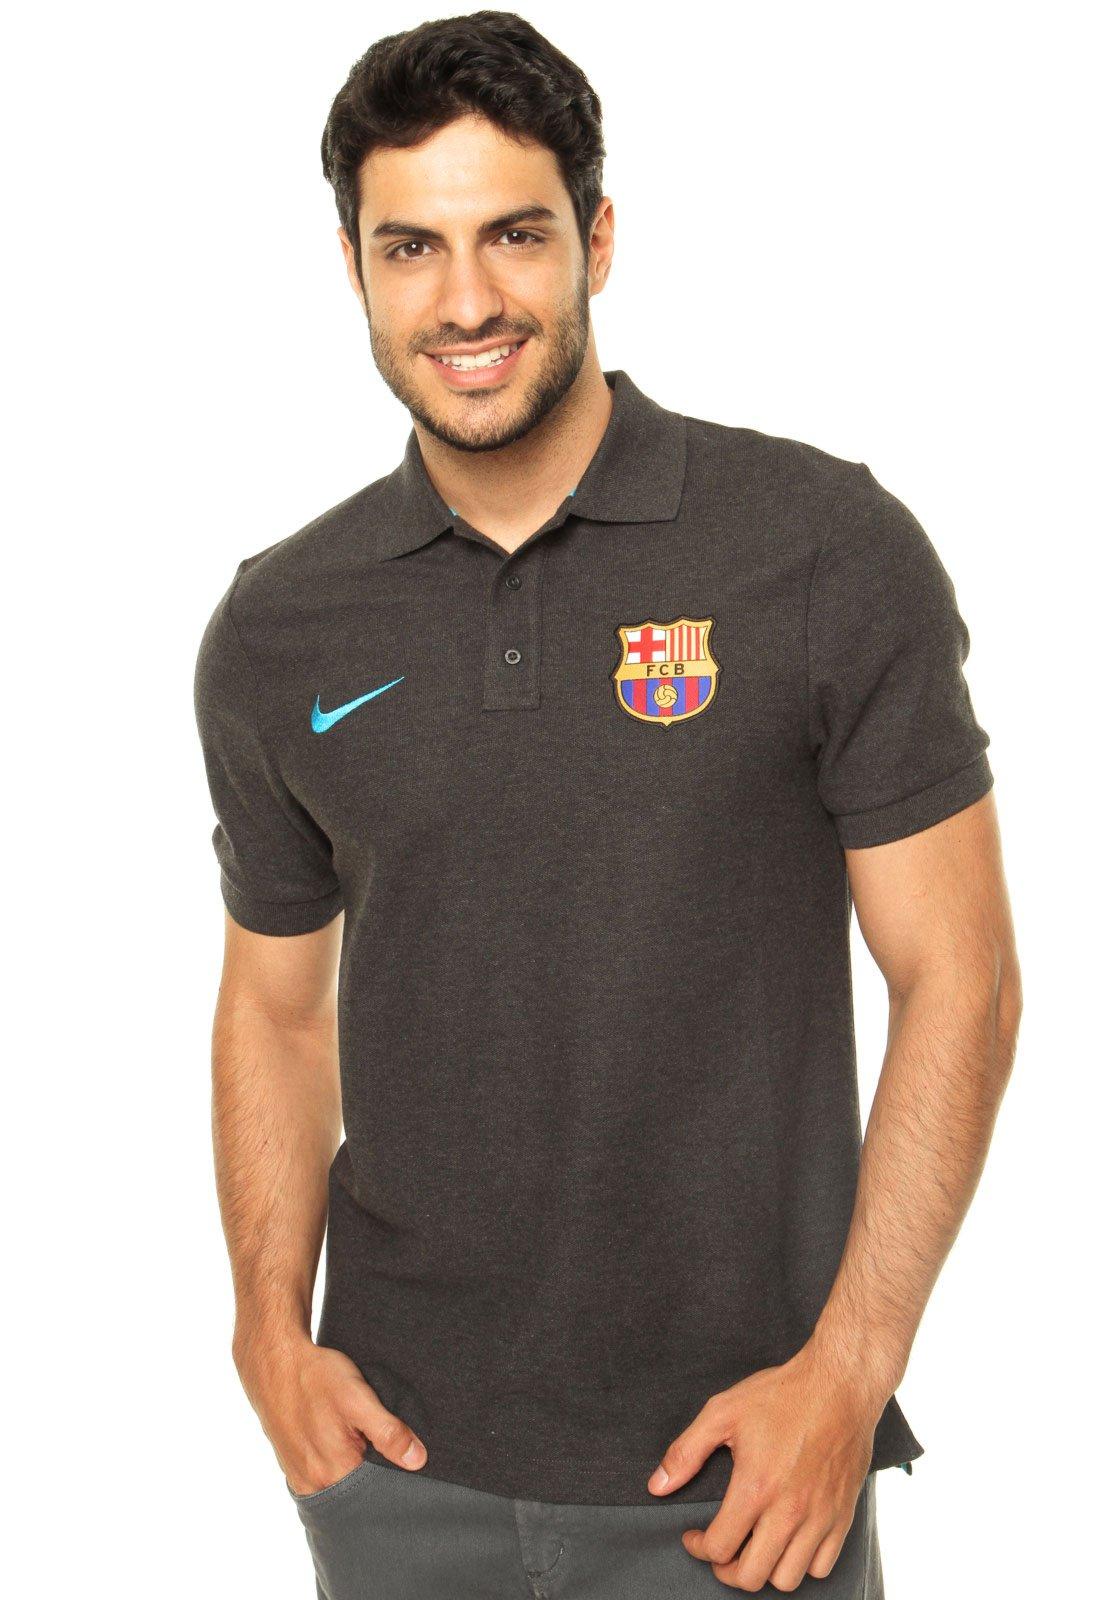 Aniquilar Venta ambulante Pantano  Camisa Polo Nike Matchup Barcelona Core Cinza - Compre Agora   Dafiti Brasil